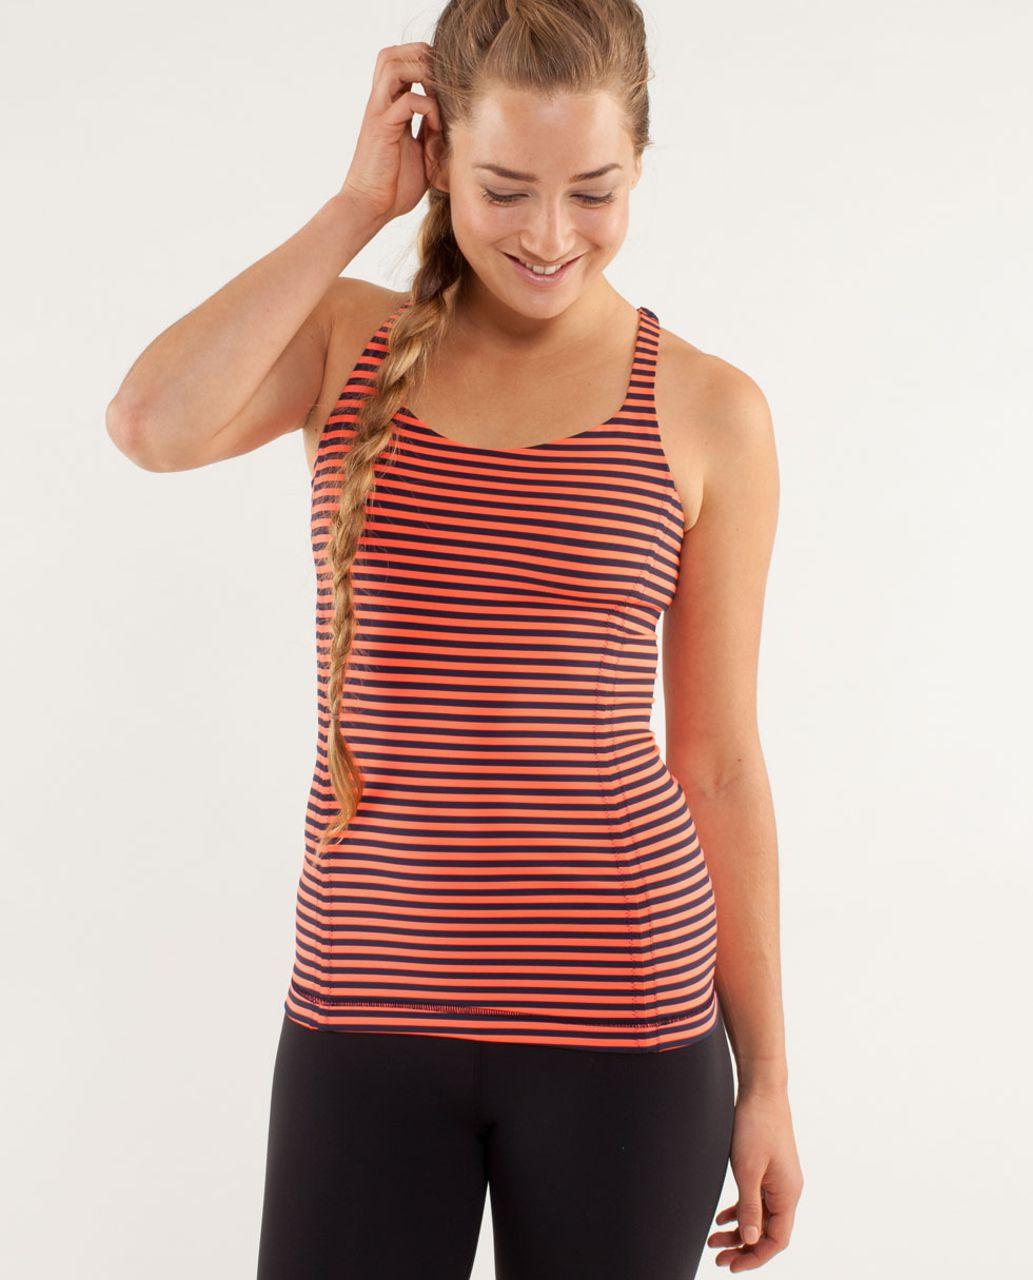 Lululemon Free To Be Tank - Classic Stripe Light Flare Inkwell / Sea Stripe Light Flare Inkwell